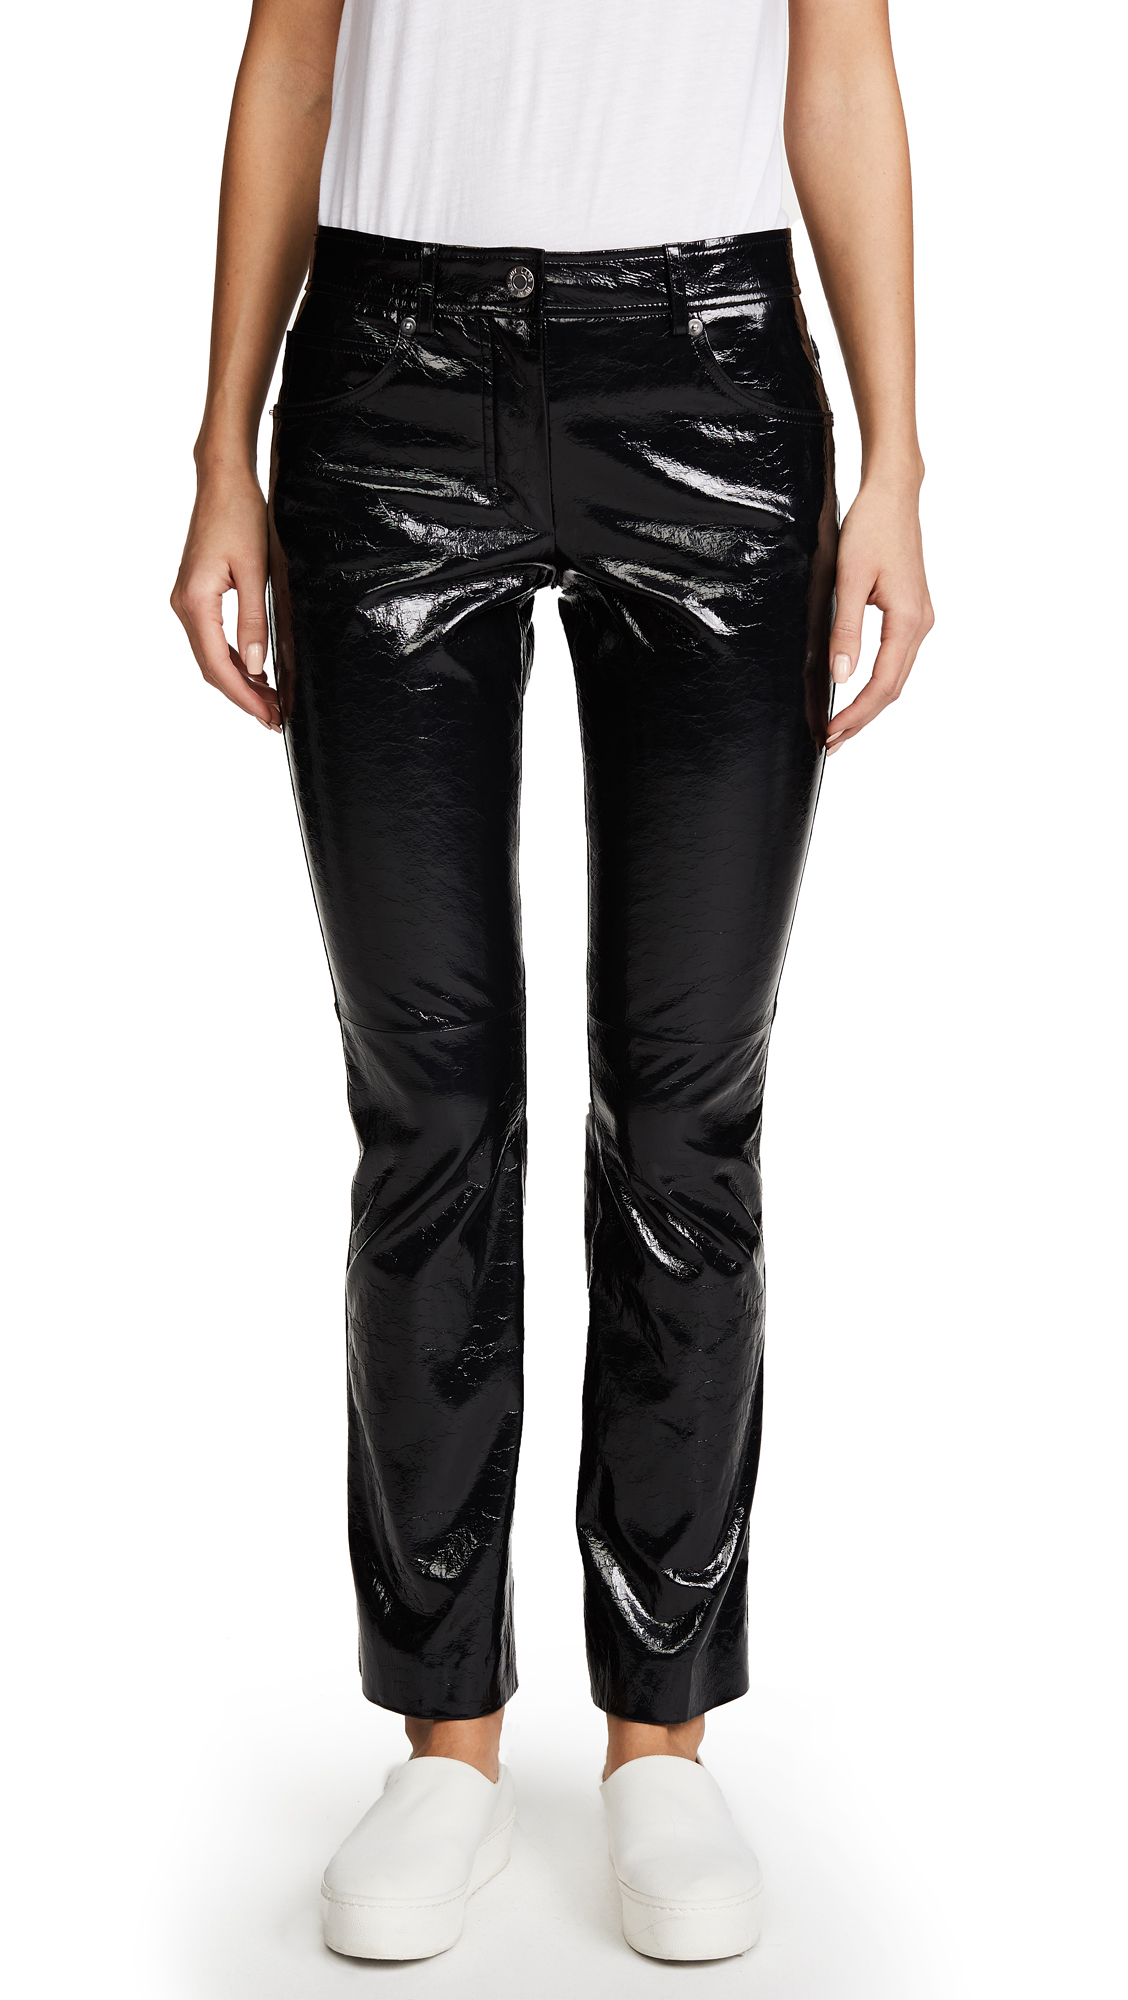 Helmut Lang Patent Cropped Flare Pants - Black